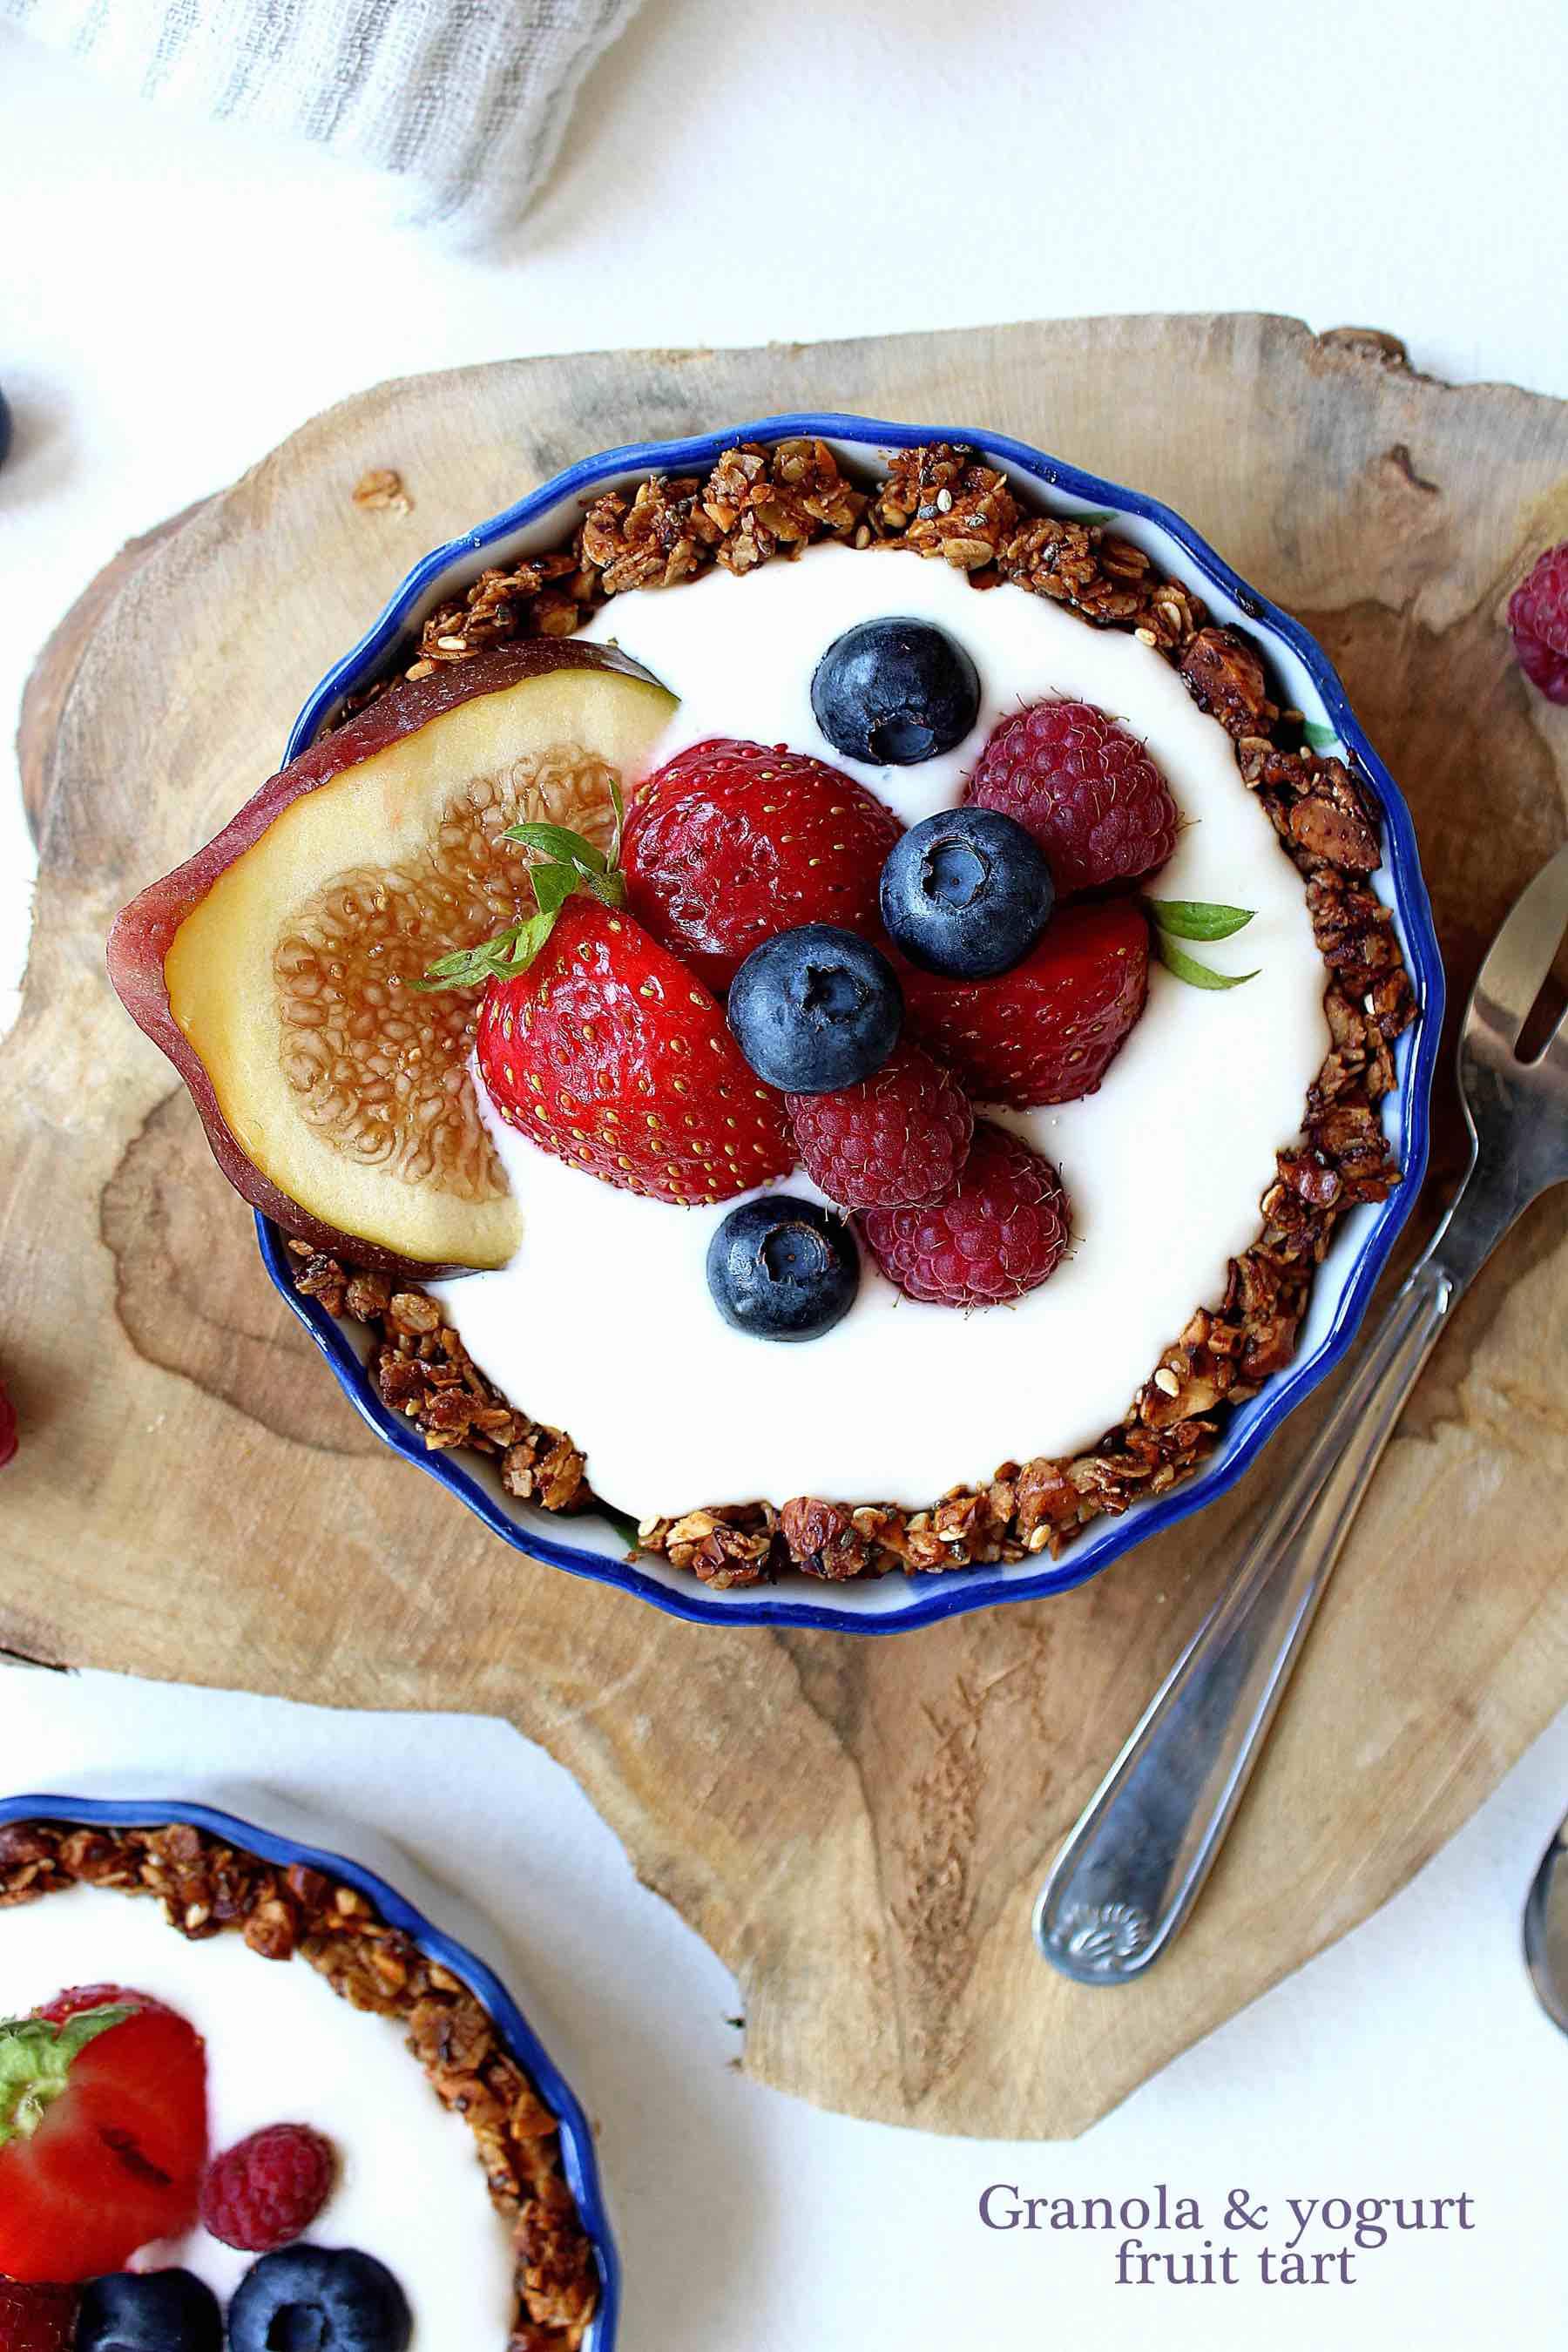 Granola and yogurt fruit tart